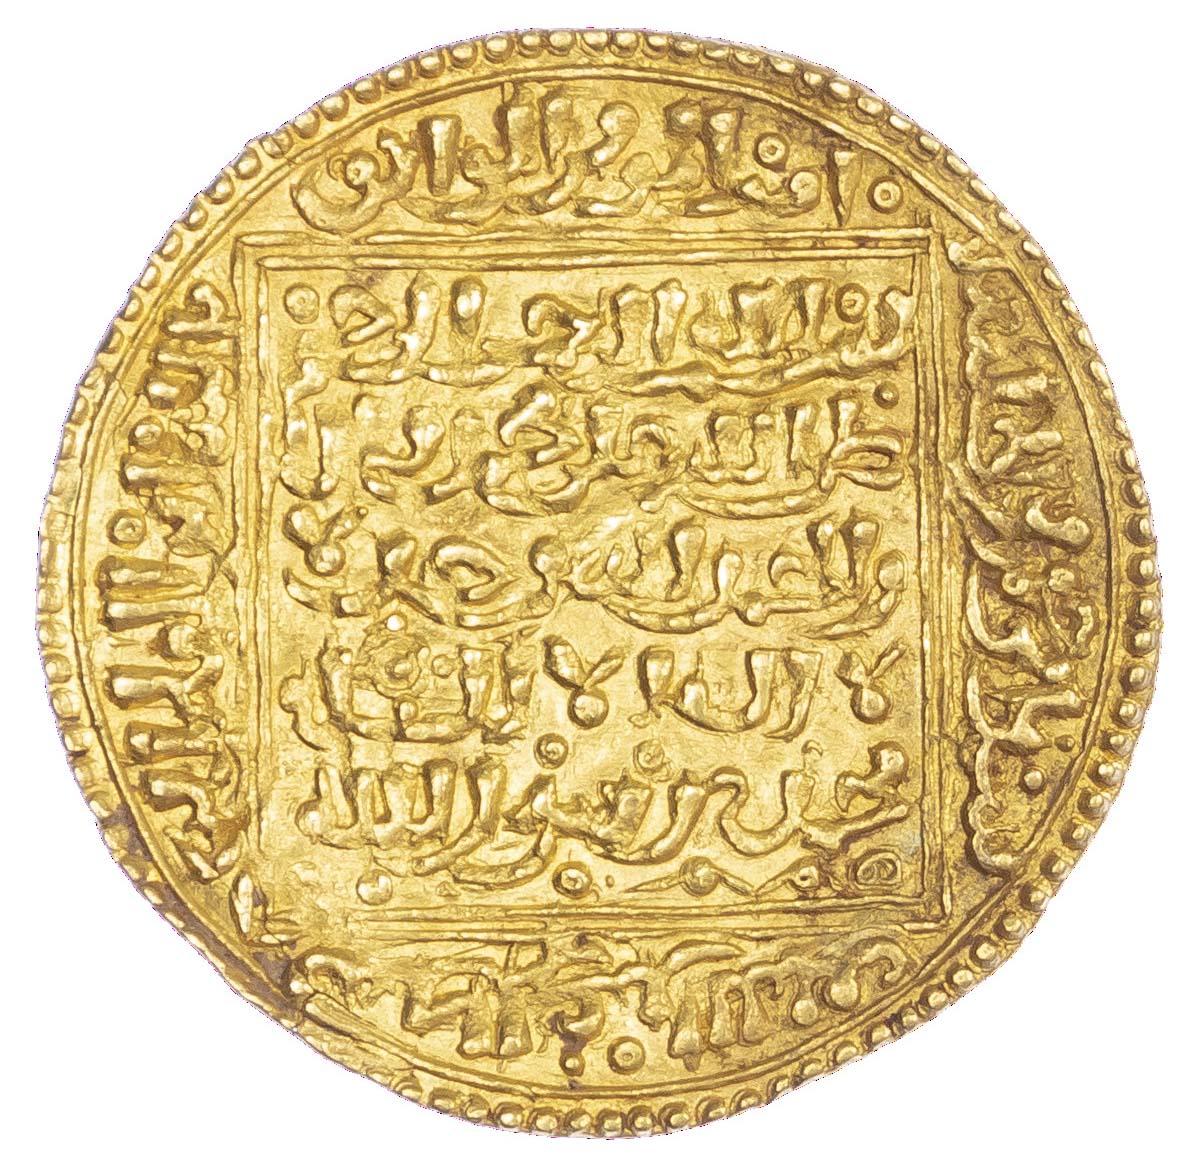 Almohads, Abu'l 'Ula Idris II (AH 665-668 / 1268-1270 AD), gold Dinar